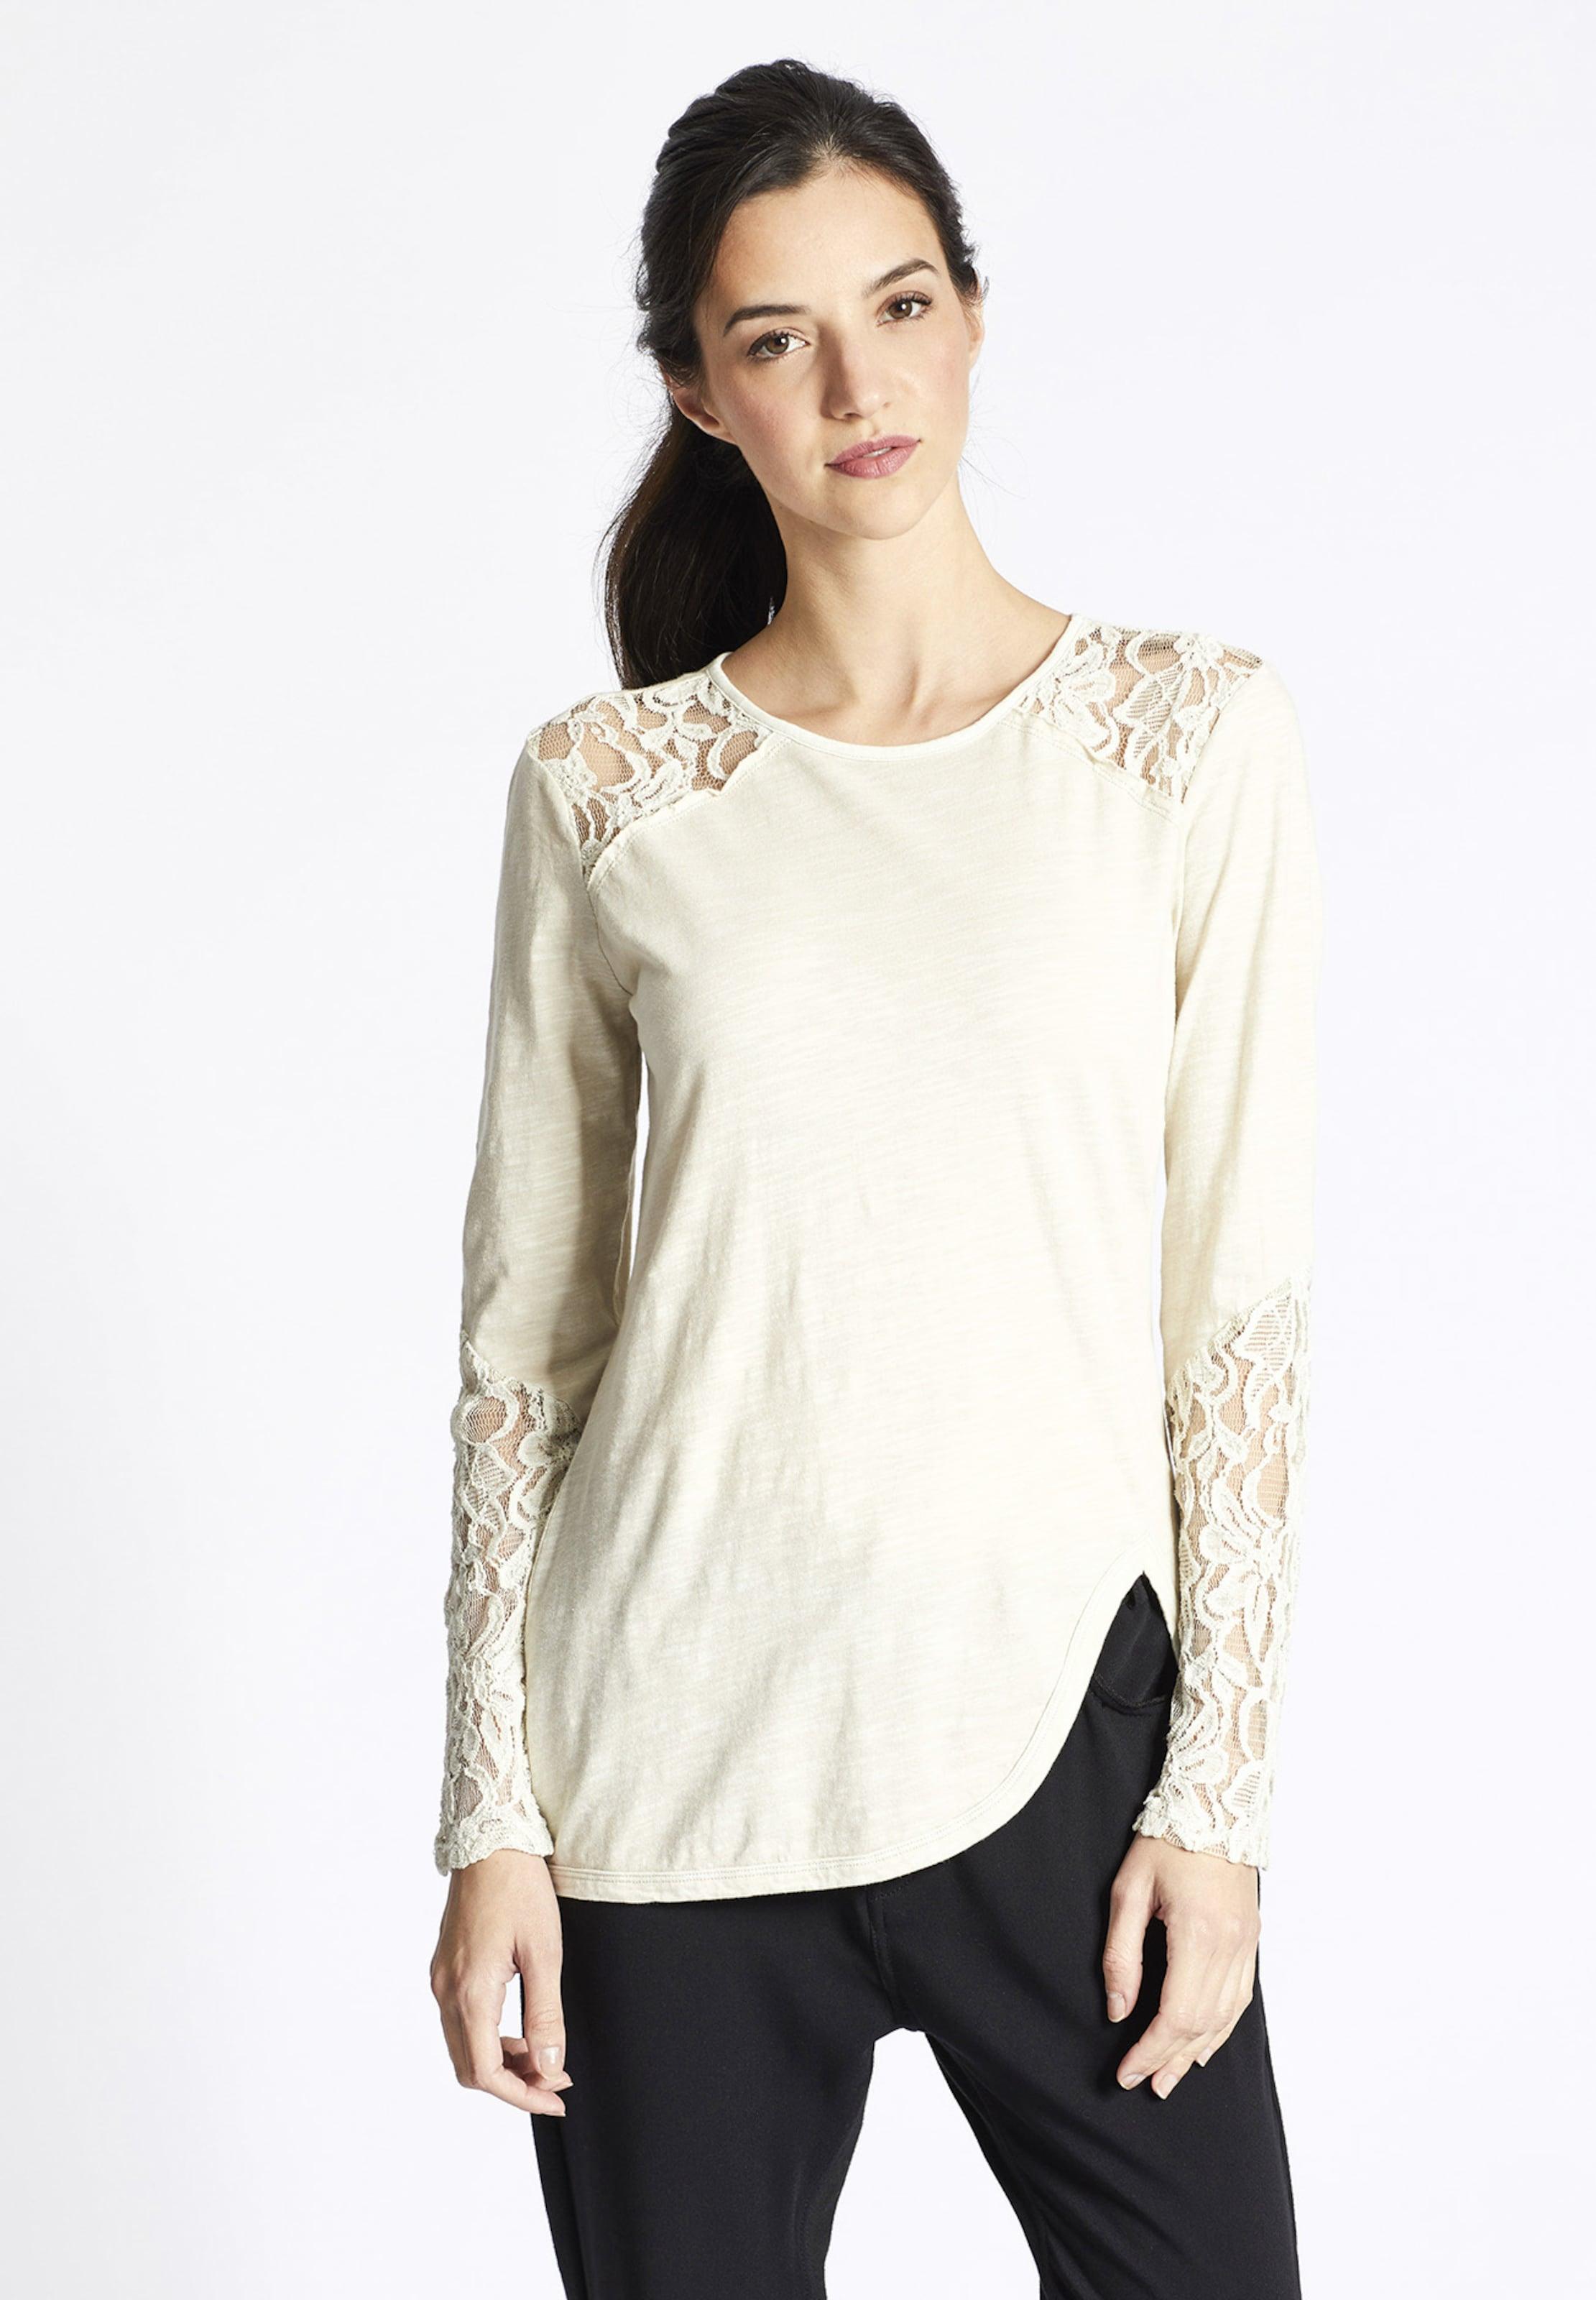 Erkunden Günstigen Preis khujo Shirt 'KANTE' Preiswerte Reale Eastbay Günstig Kaufen Billig MjtppJ3